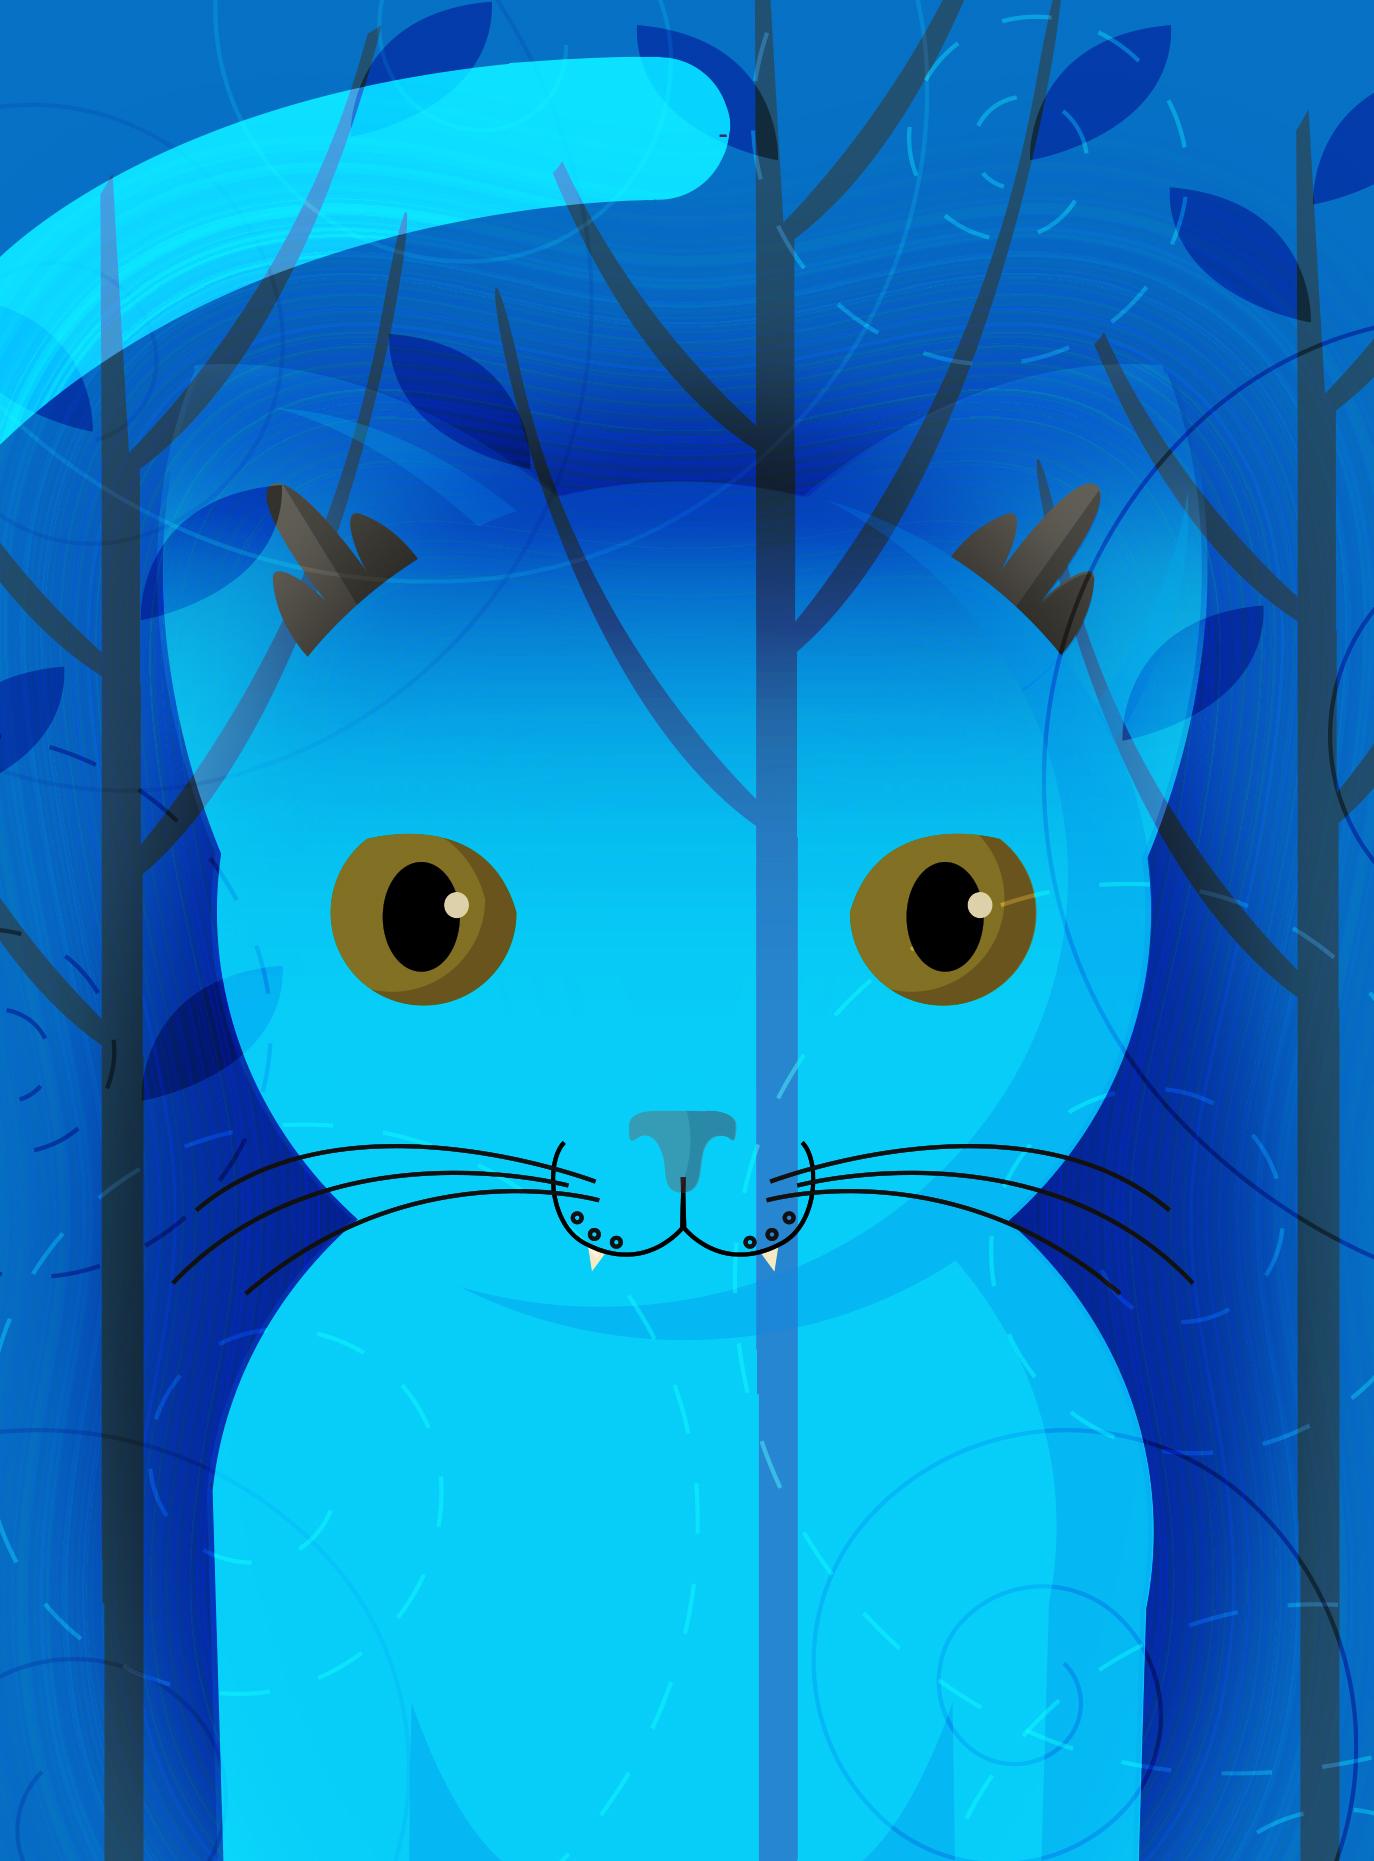 catcard.ghost.jpg